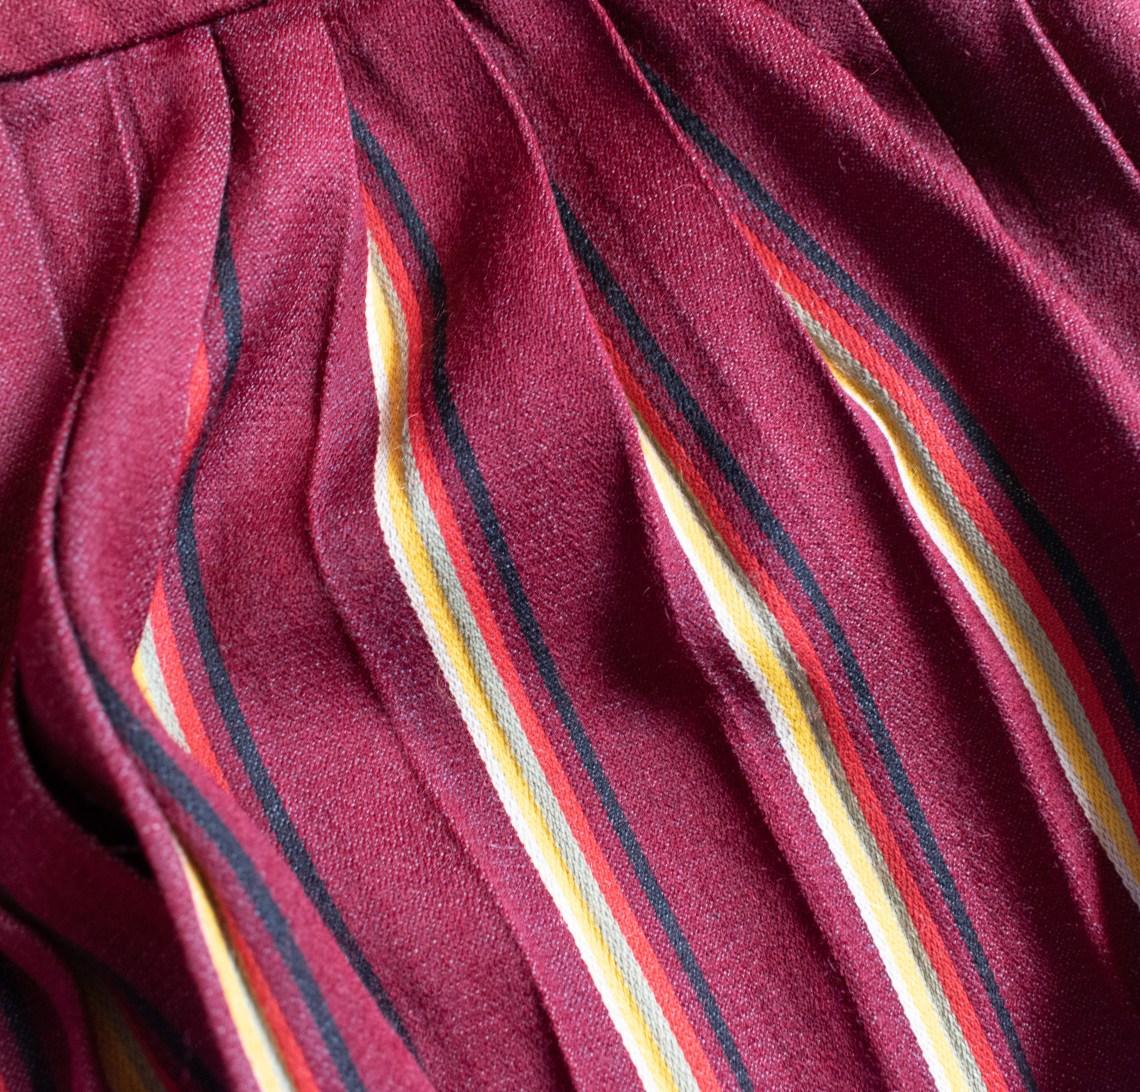 Kokkola skirt fabric